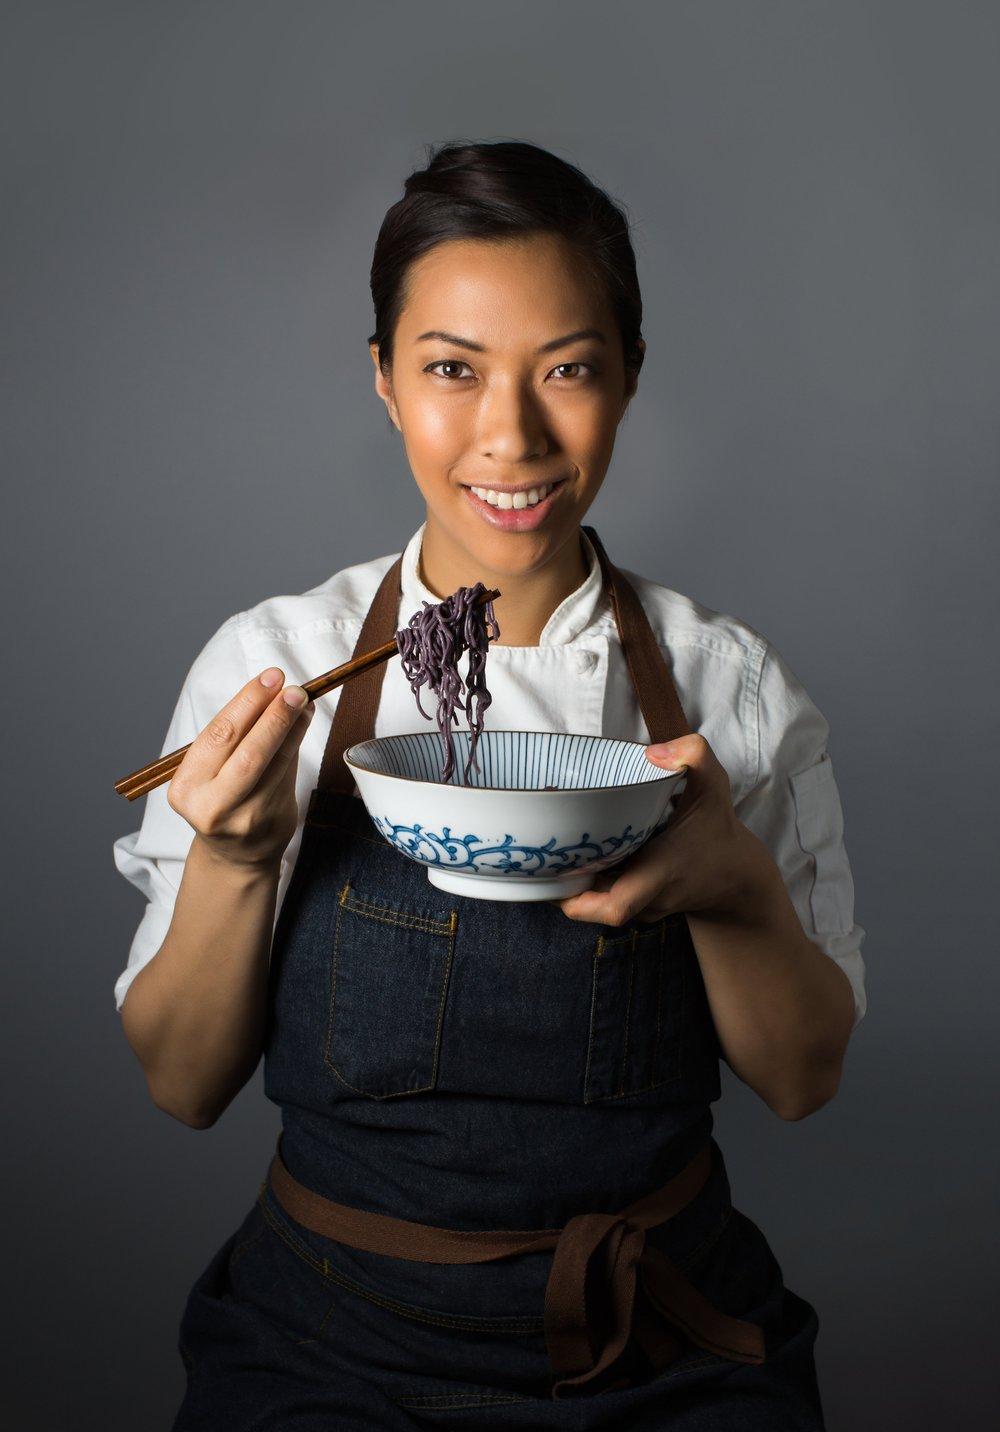 Chef Tiffany Senin